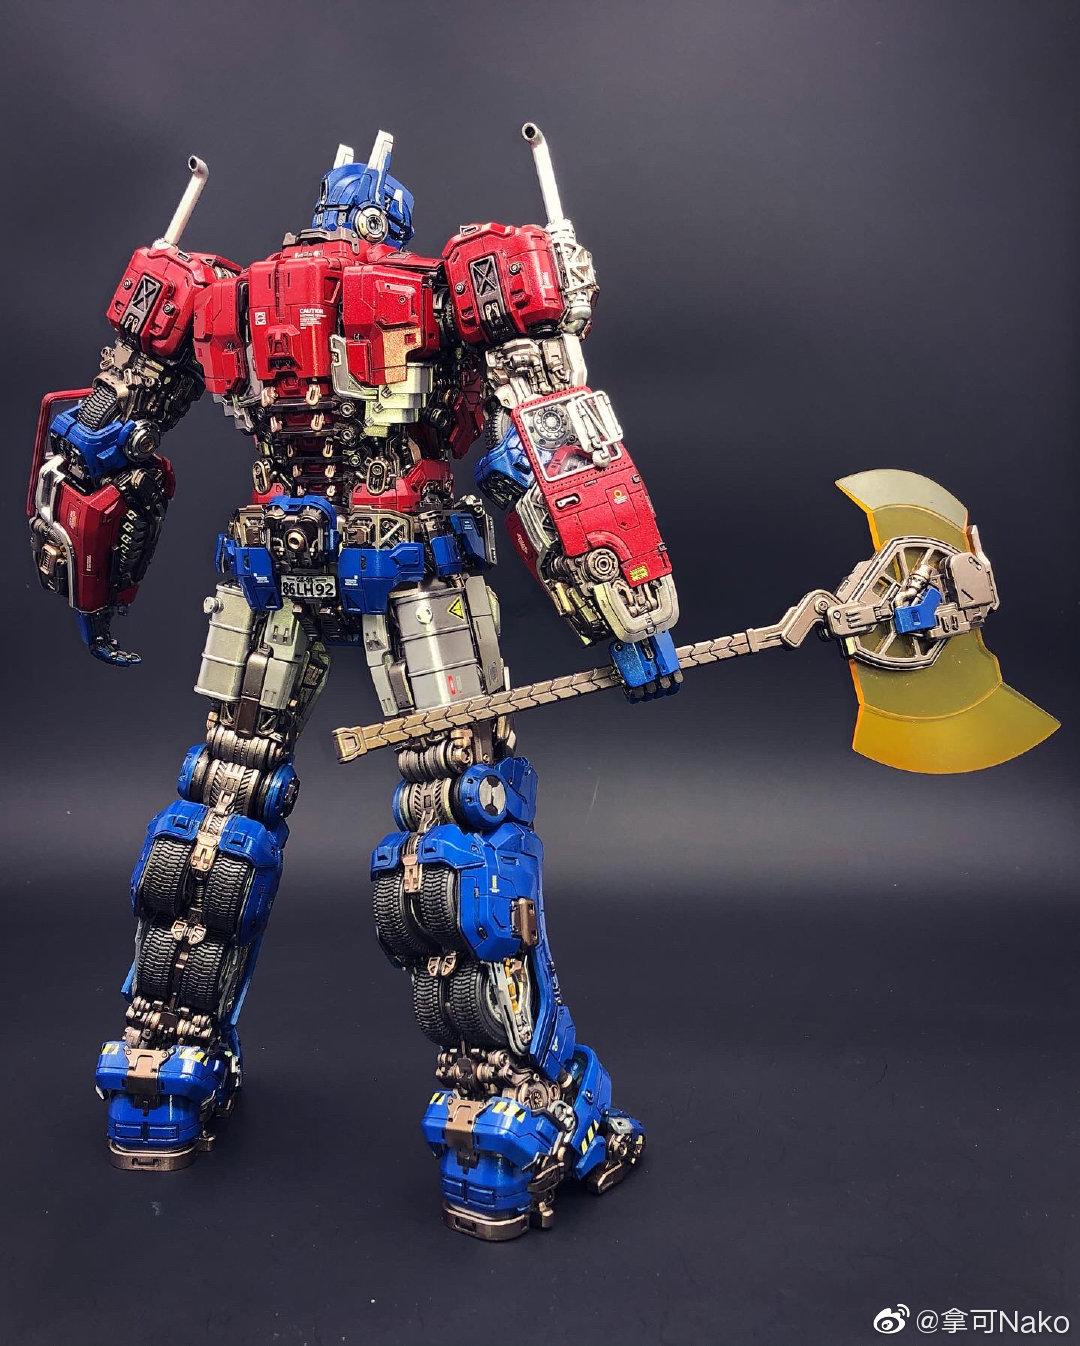 G798_NakoMake_Optimus_Prime_BUMBLEBEE_ver_GK_039.jpg